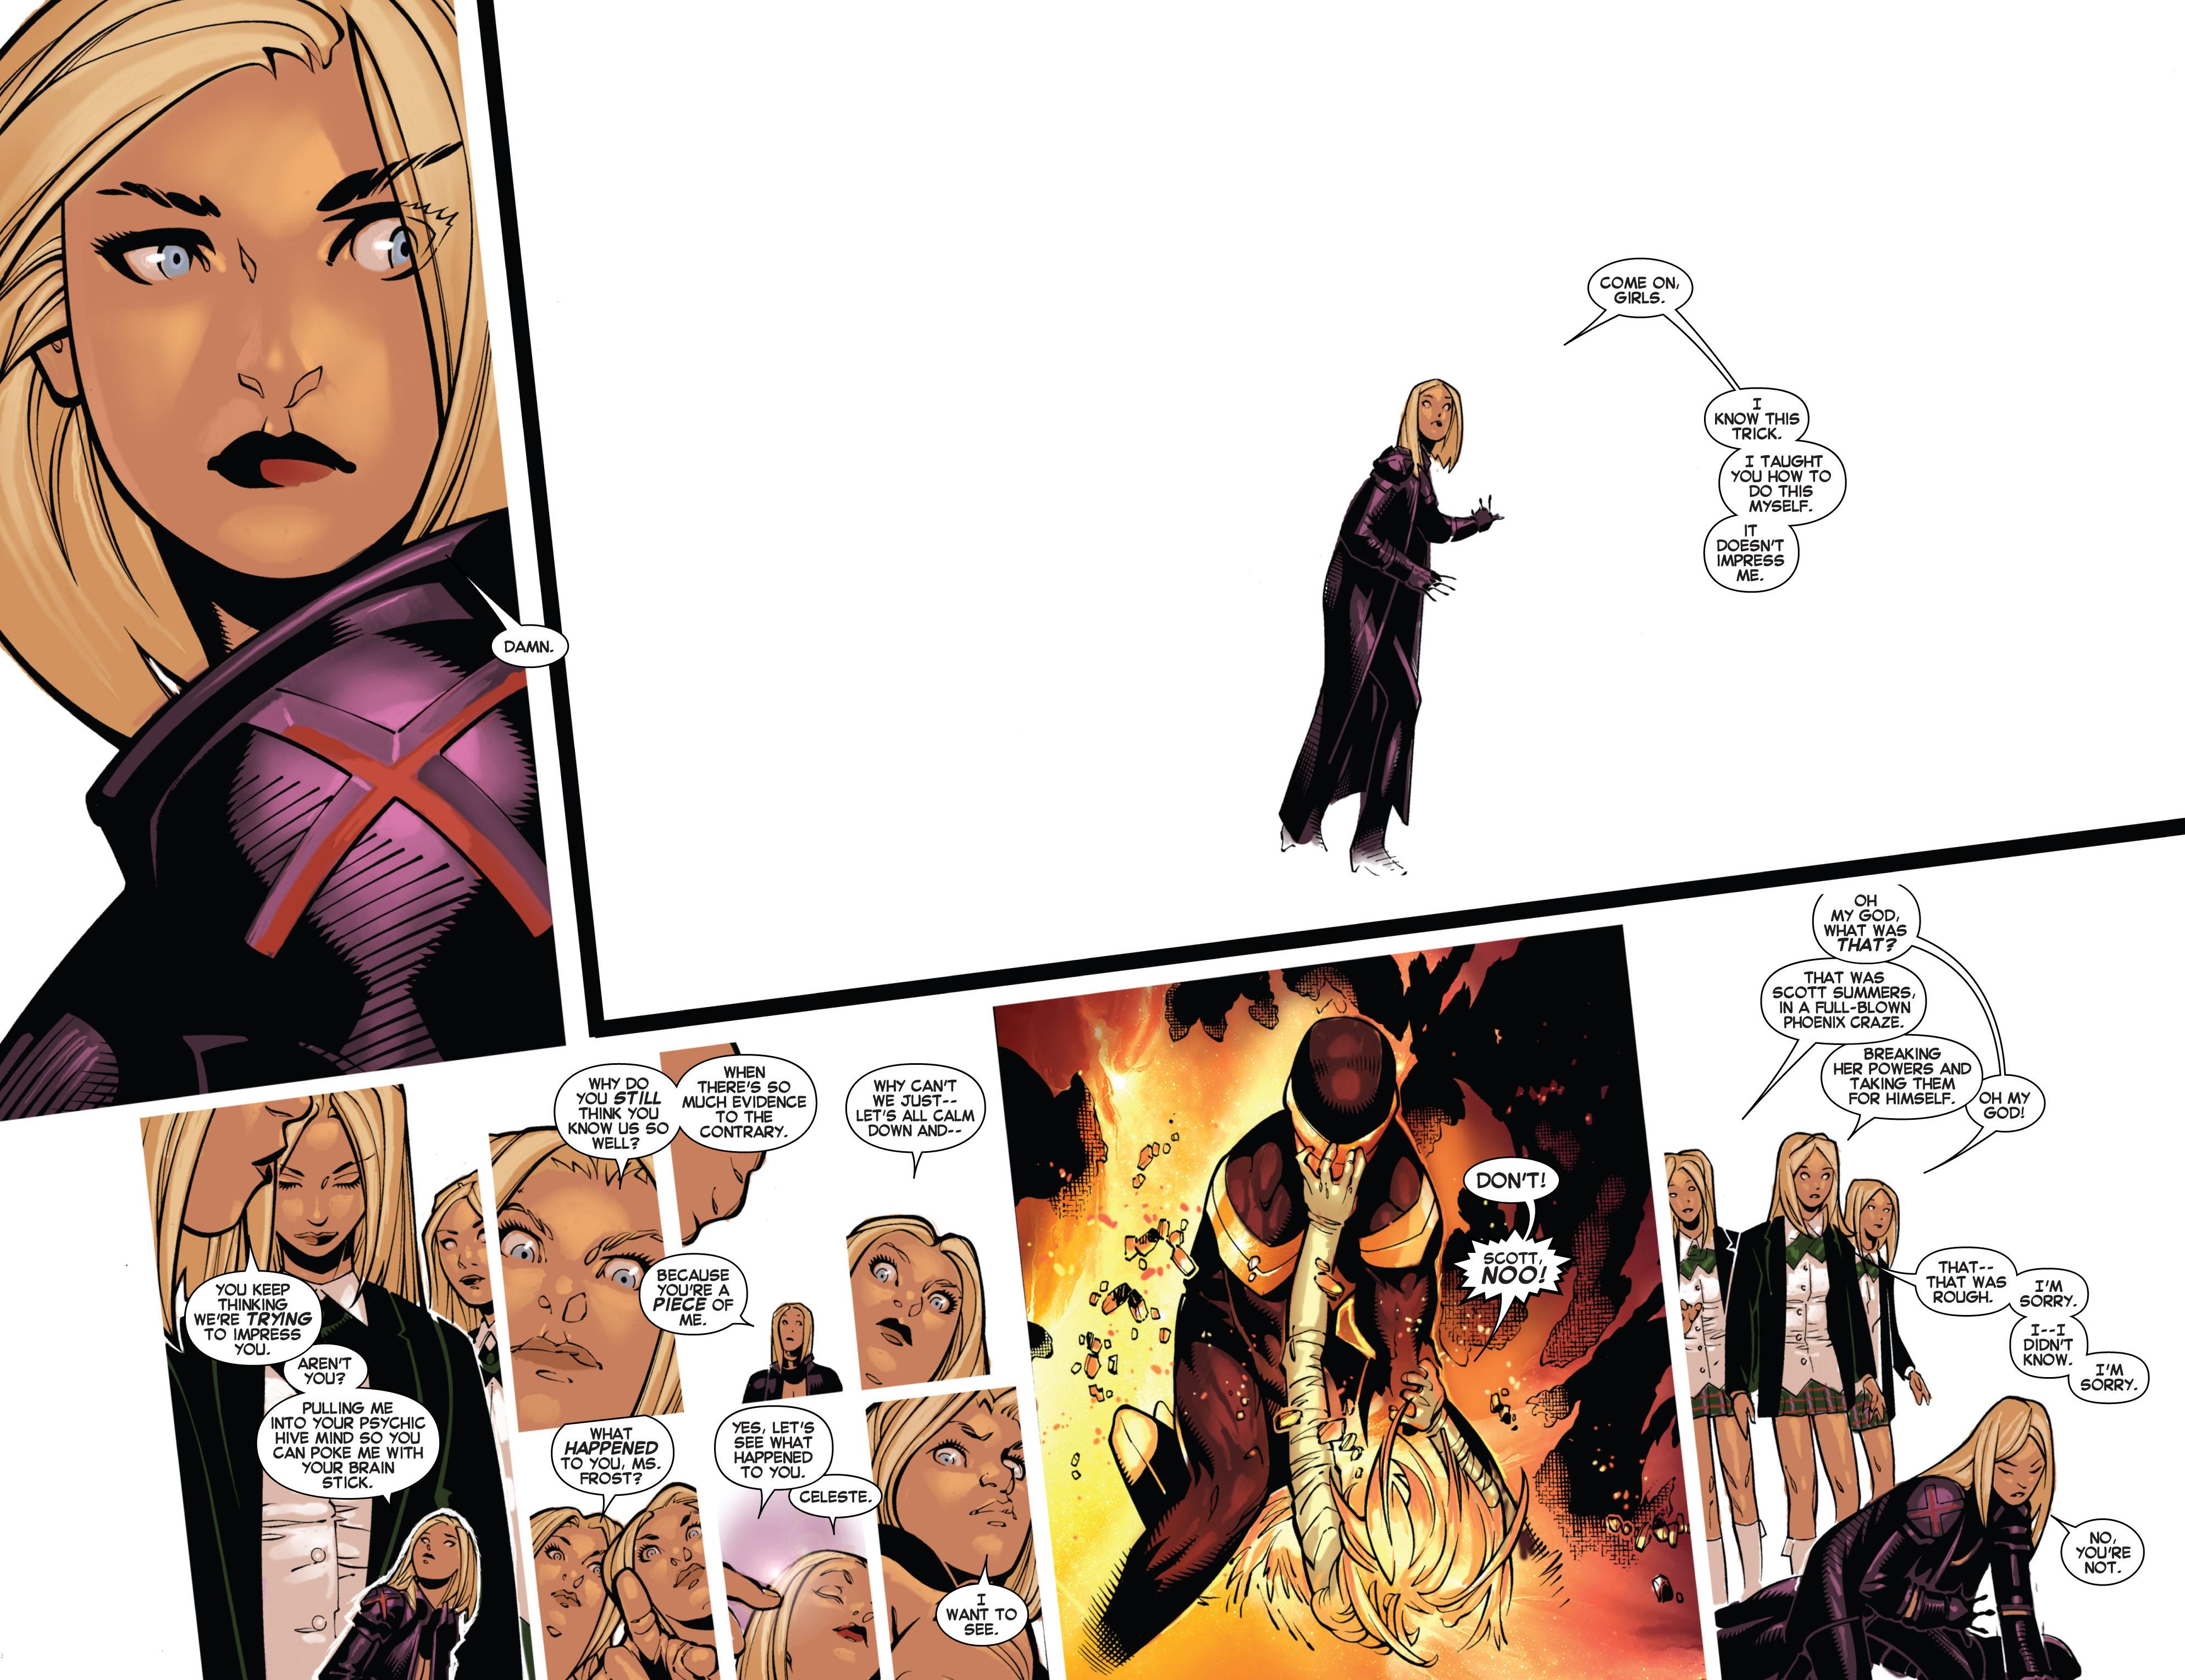 Read online Uncanny X-Men (2013) comic -  Issue # _TPB 1 - Revolution - 70